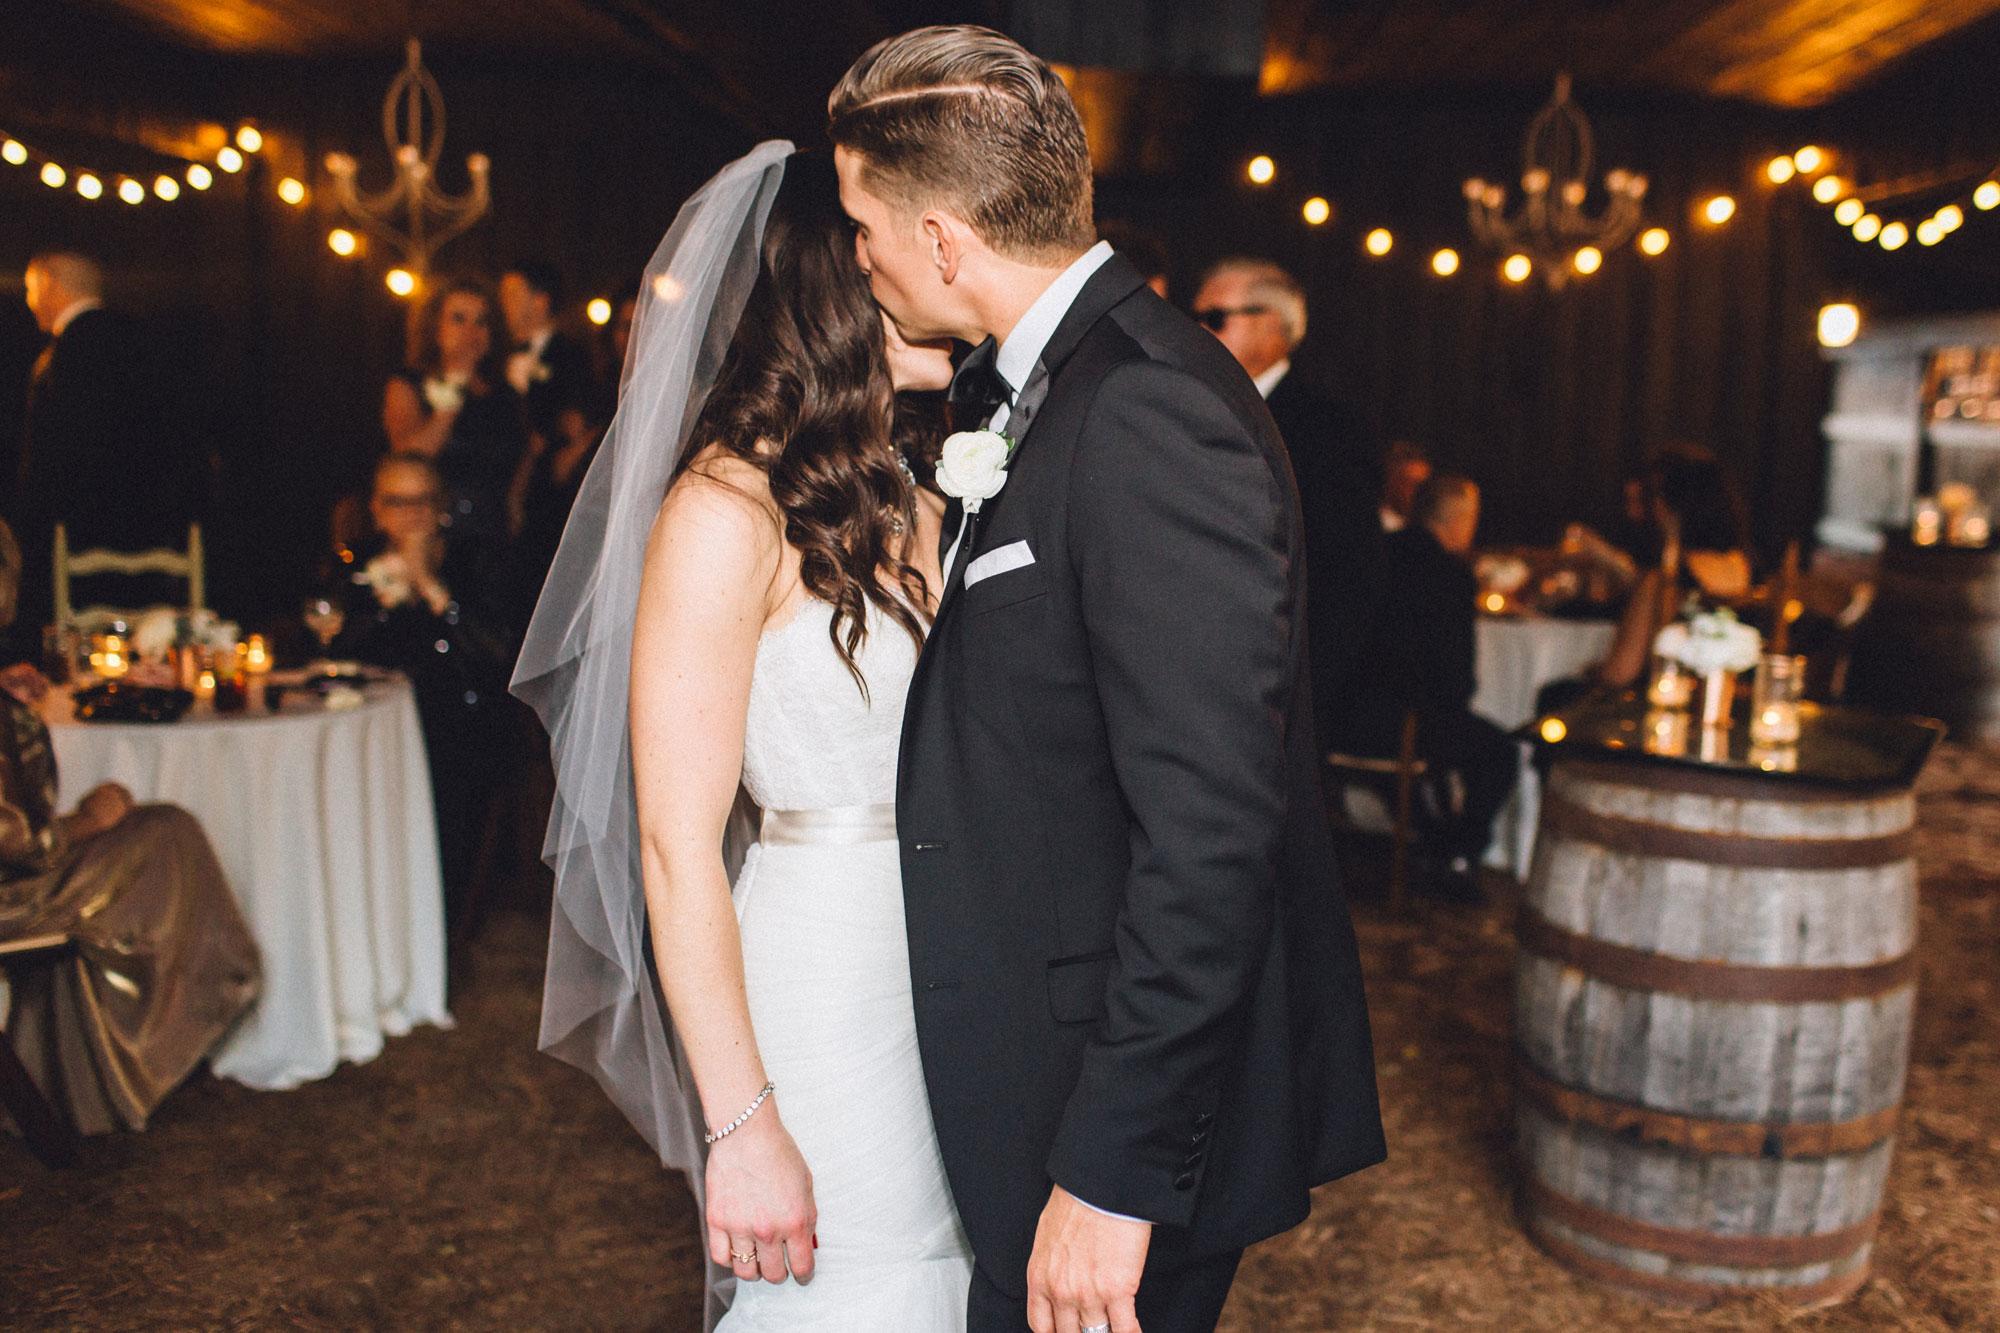 Me & Mr. Jones Wedding, Cocktail Hour in the Barn, Black Tie Wedding, Rustic Glam Wedding, Bourbon Barrel Cocktail Tables, Ballet Length Veil